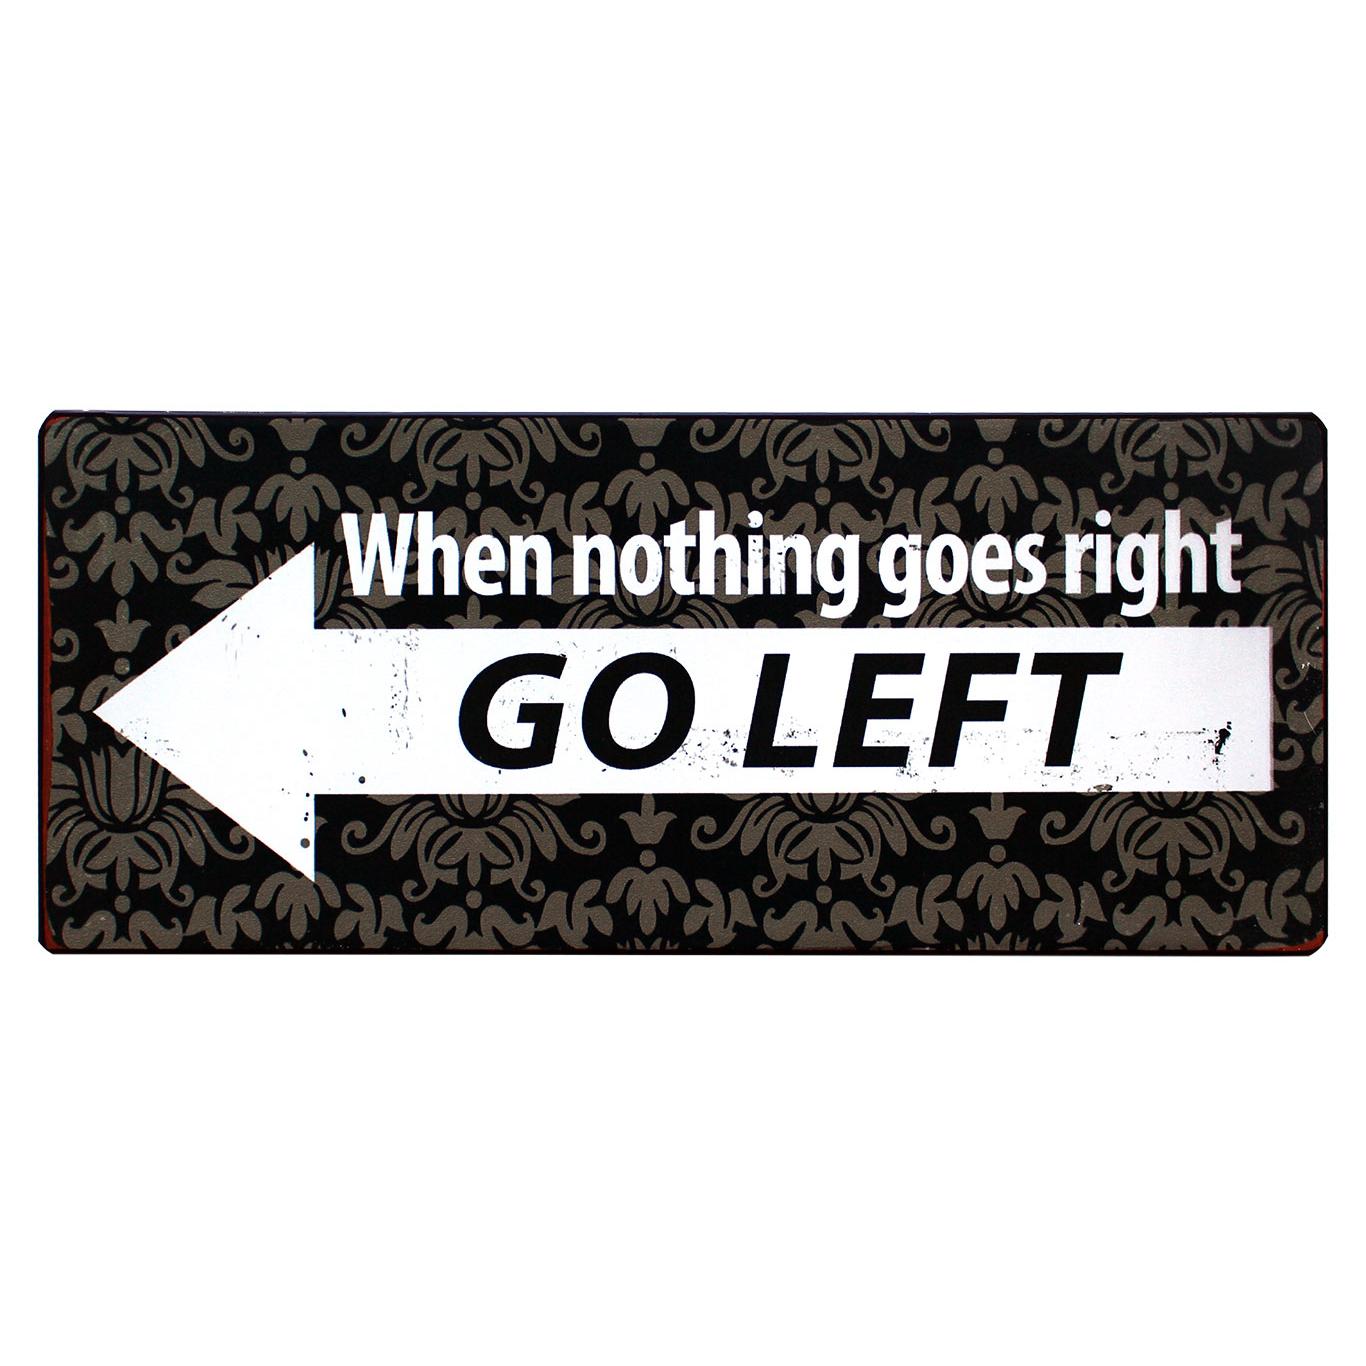 em3790-when-nothing-goes-right-go-left-rustiek-tekst-bord-cadeau-kado-online-metaal-deco-decoratie v